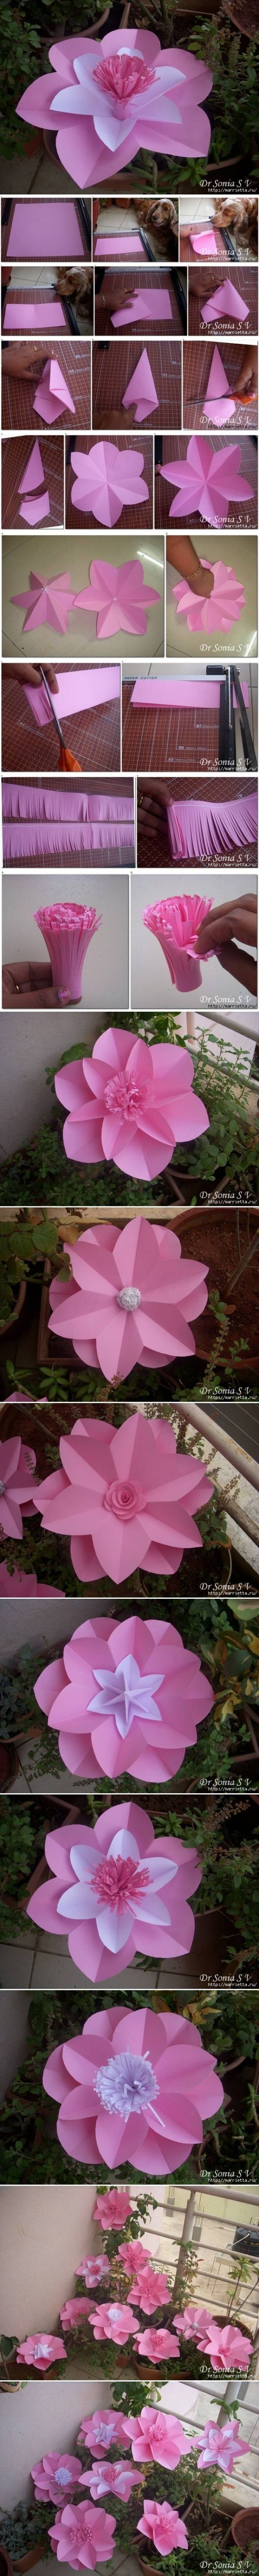 DIY Simple Beautiful Paper Flowers